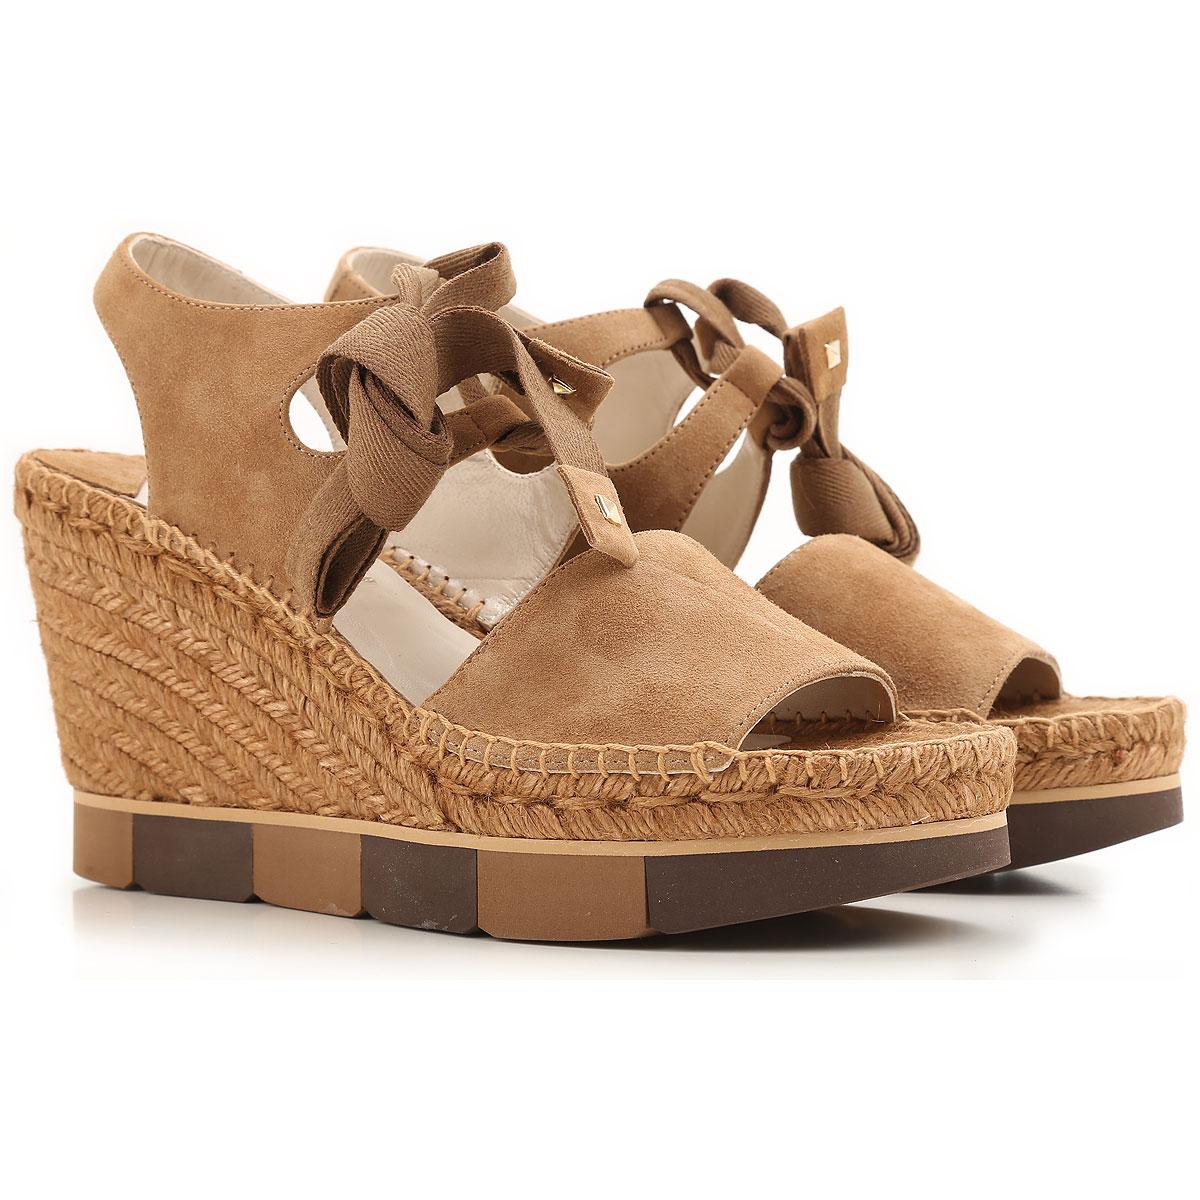 9593783ed333 Paloma Barcelo. Shoes for Women